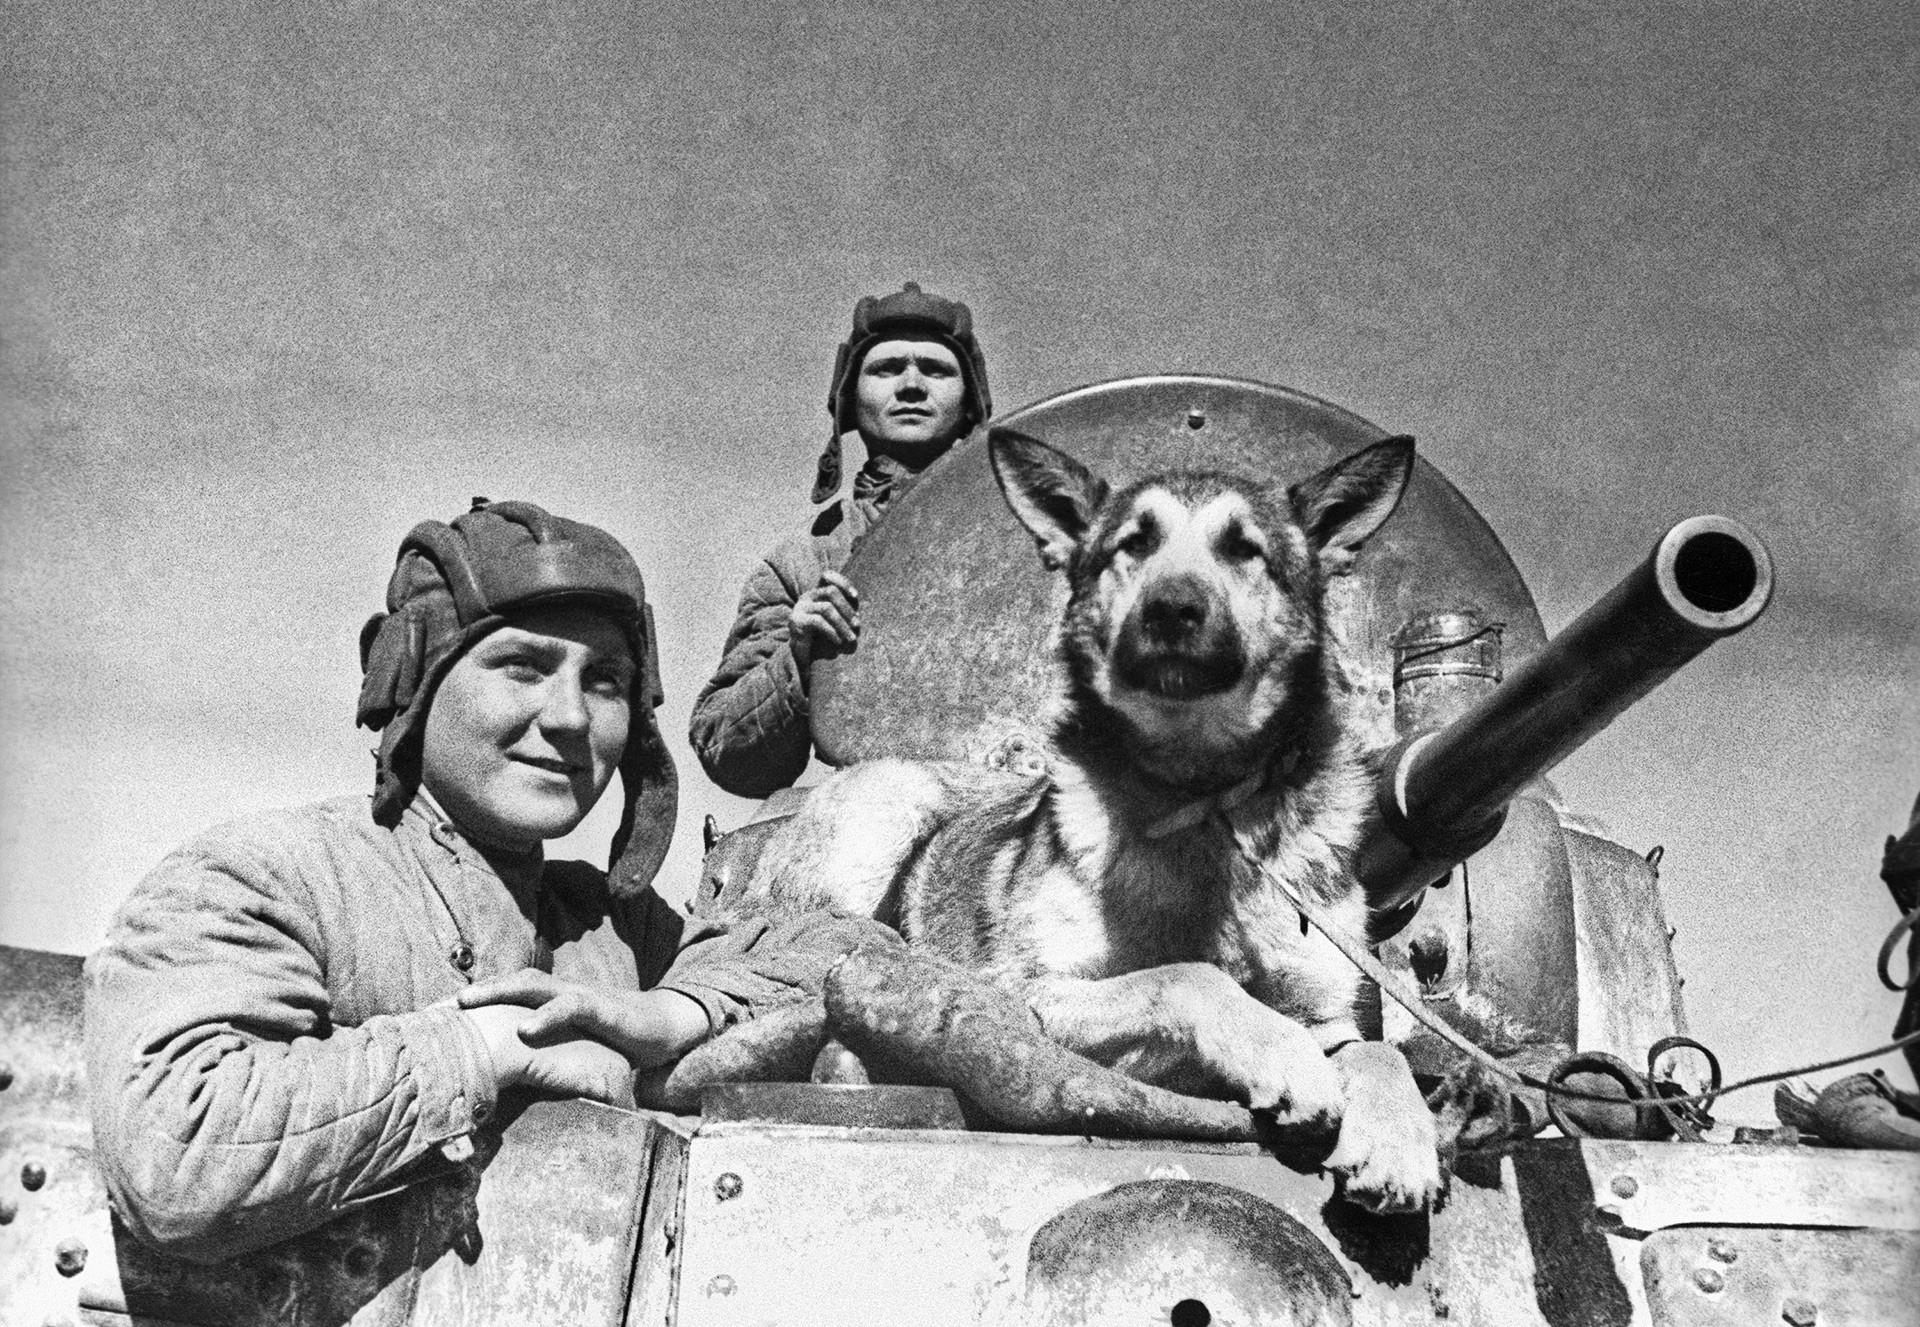 Екипажът на съветския бронеавтомобил БА-10: старши сержант Е. П. Ендрексон, сержант В. П. Поршаков, Т. Д. Деренко и овчарката Джулбарс.